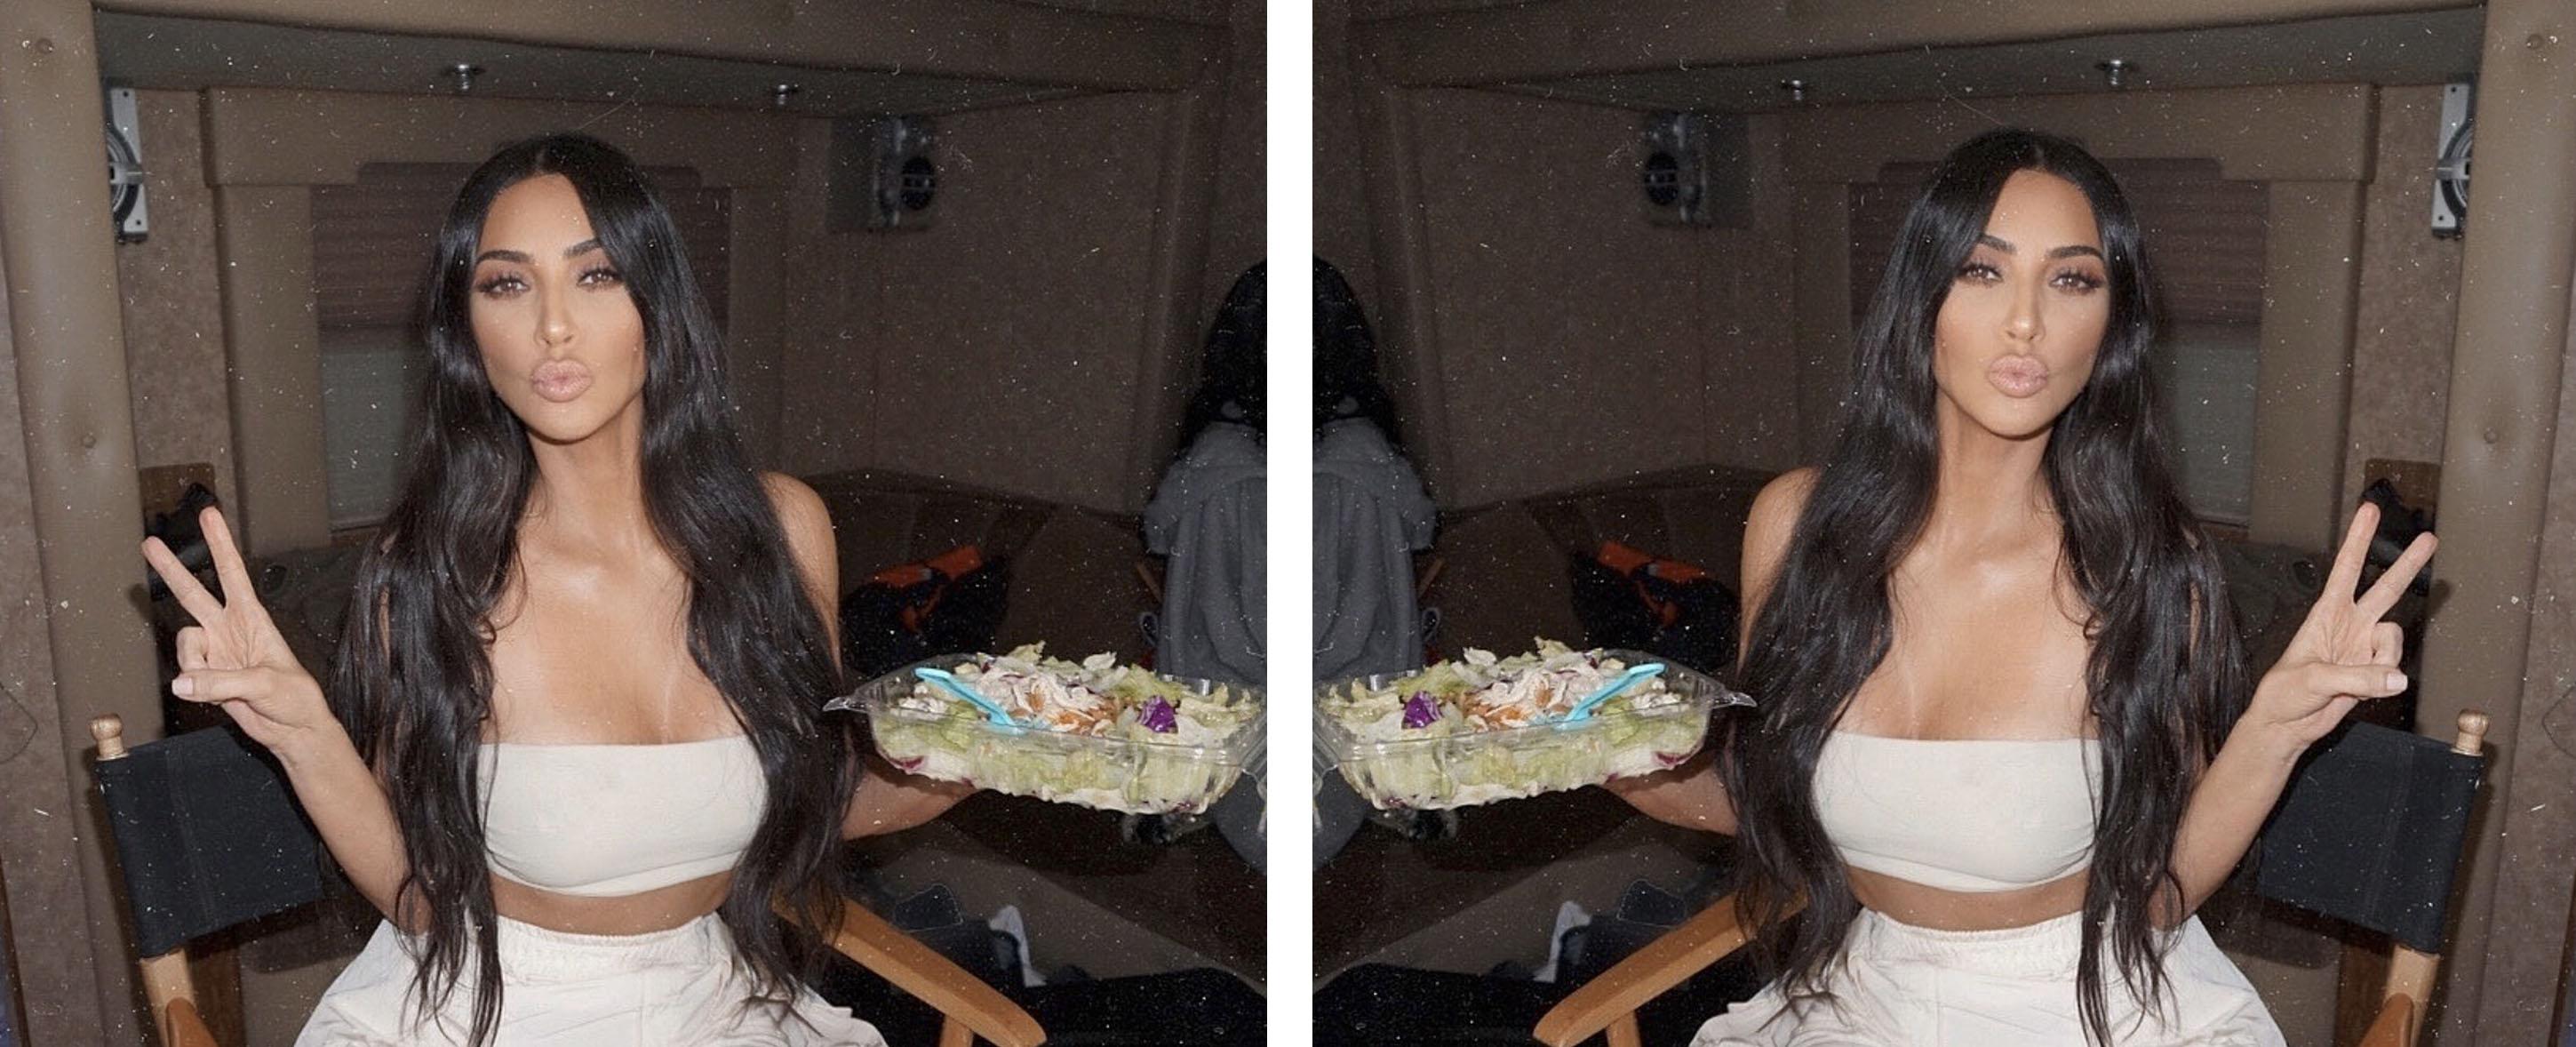 spiegel foto kim